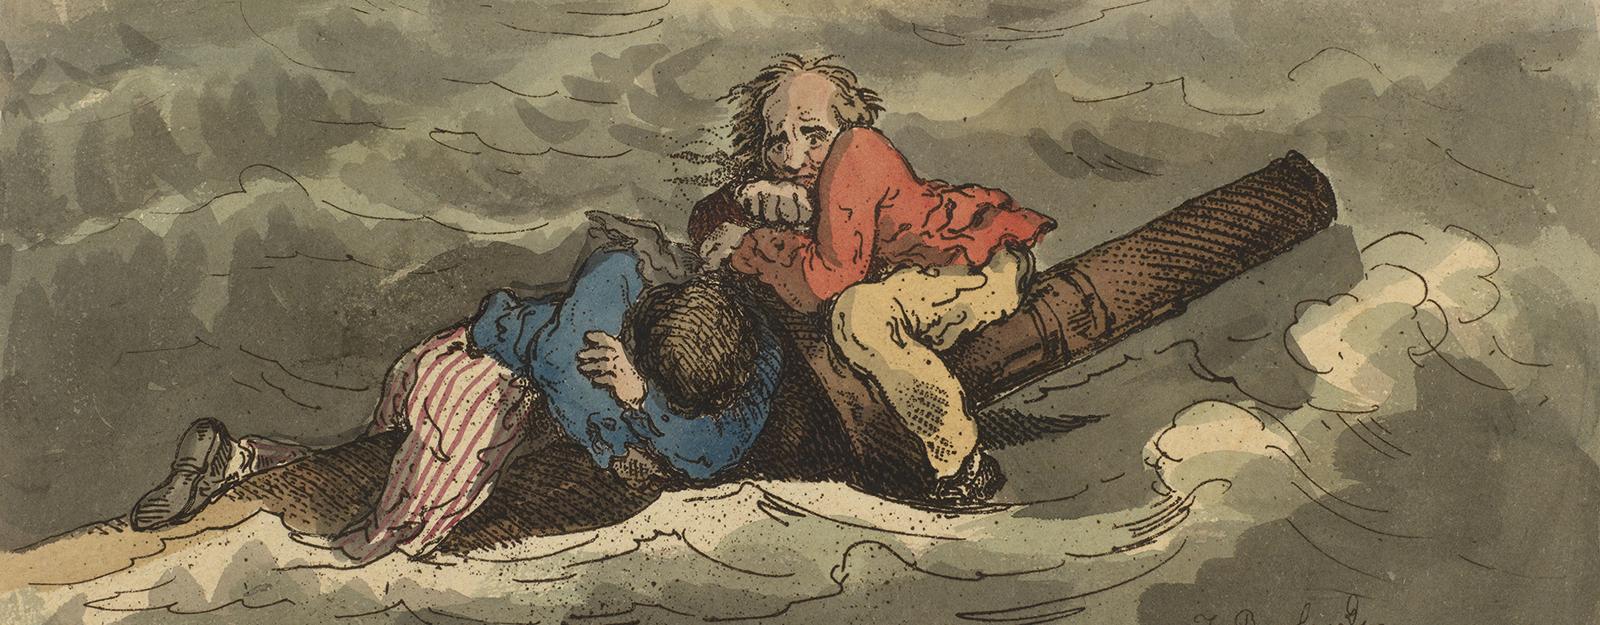 Misery, Thomas Rowlandson